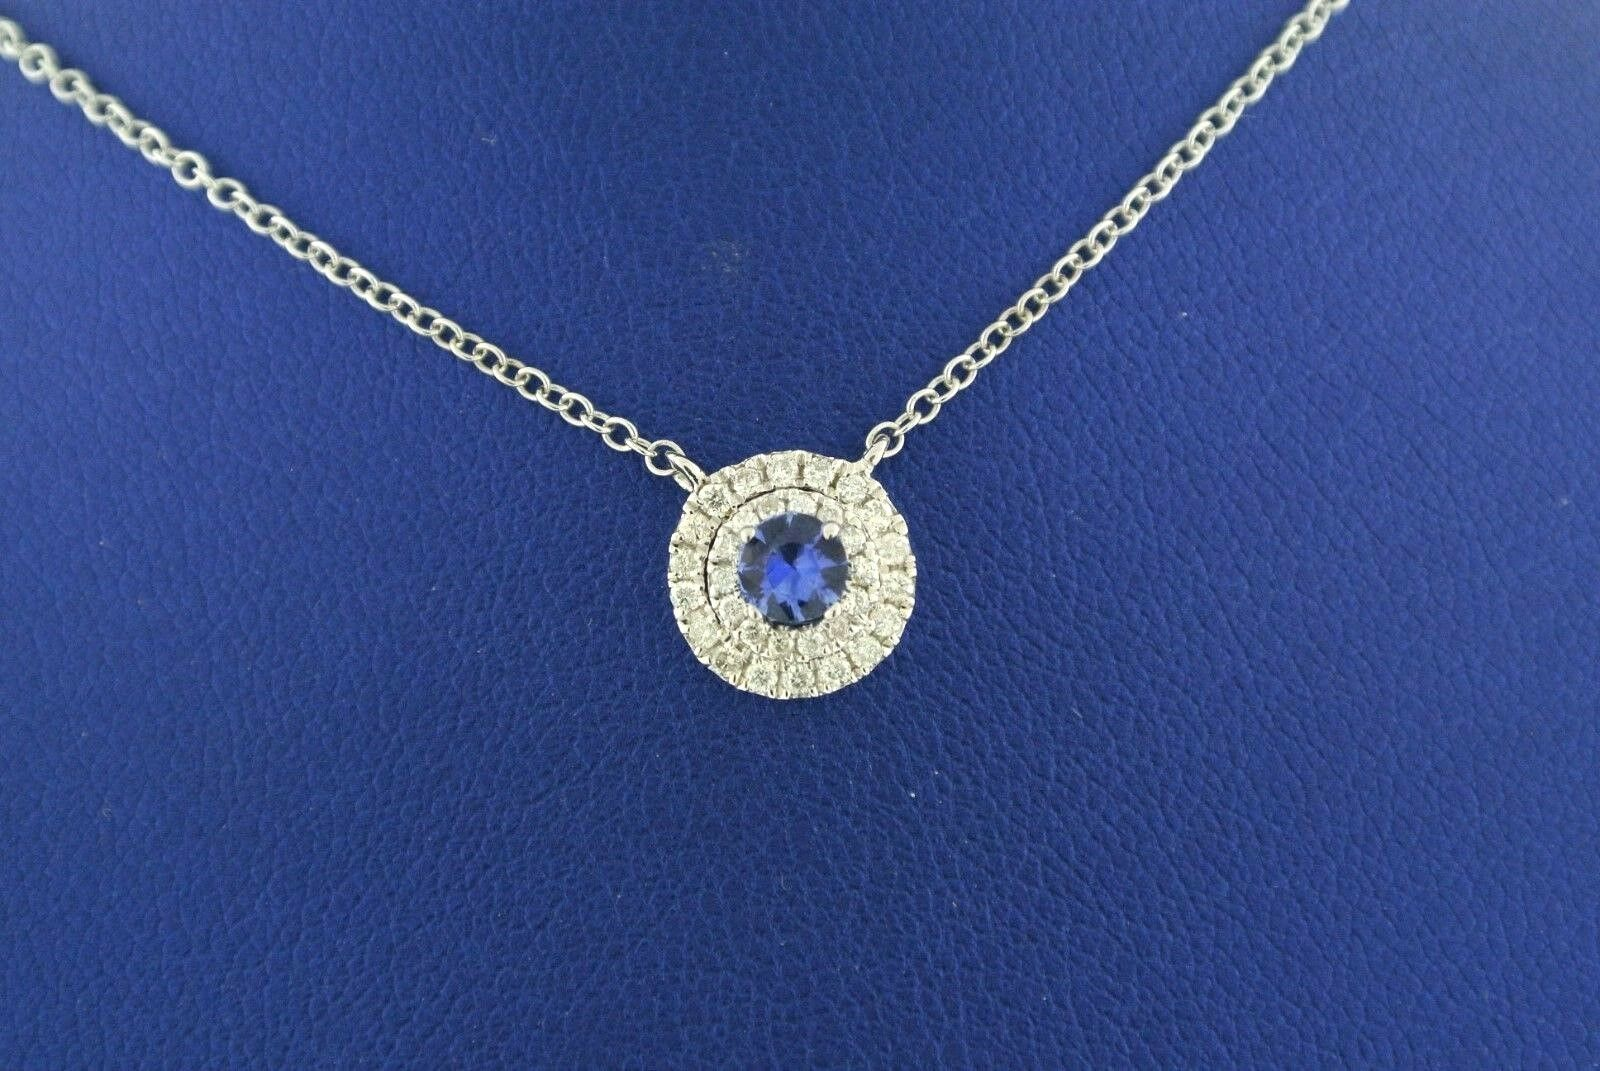 14K White gold 0.50 CT Diamond & 0.25 CT Sapphire Pendant,S101603